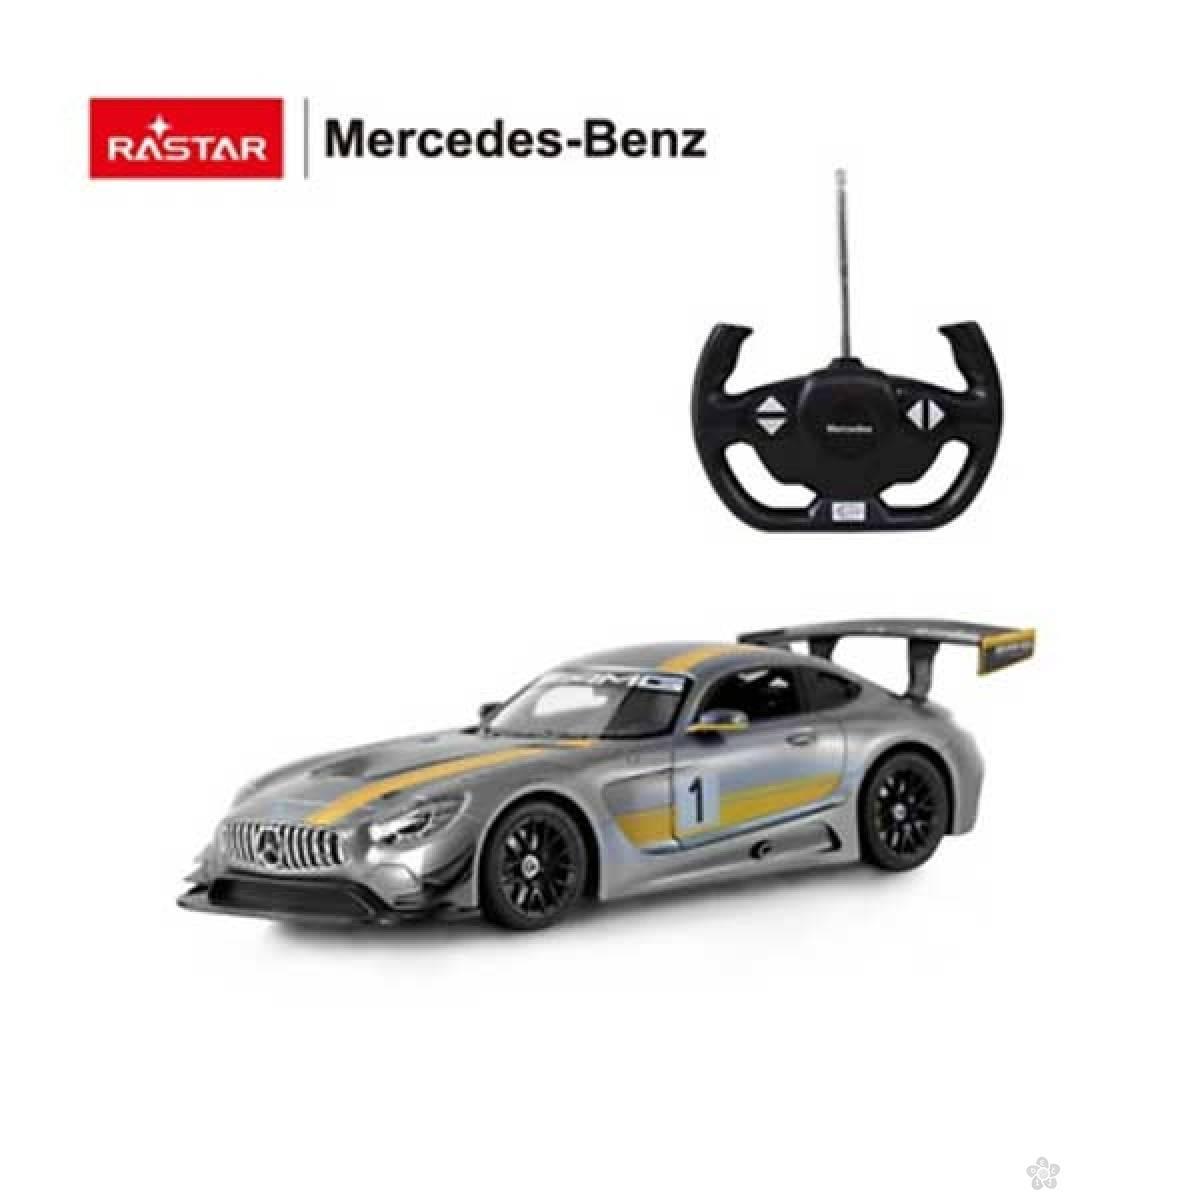 Auto R/C 1:14 Mercedes-AMG GT3 74100